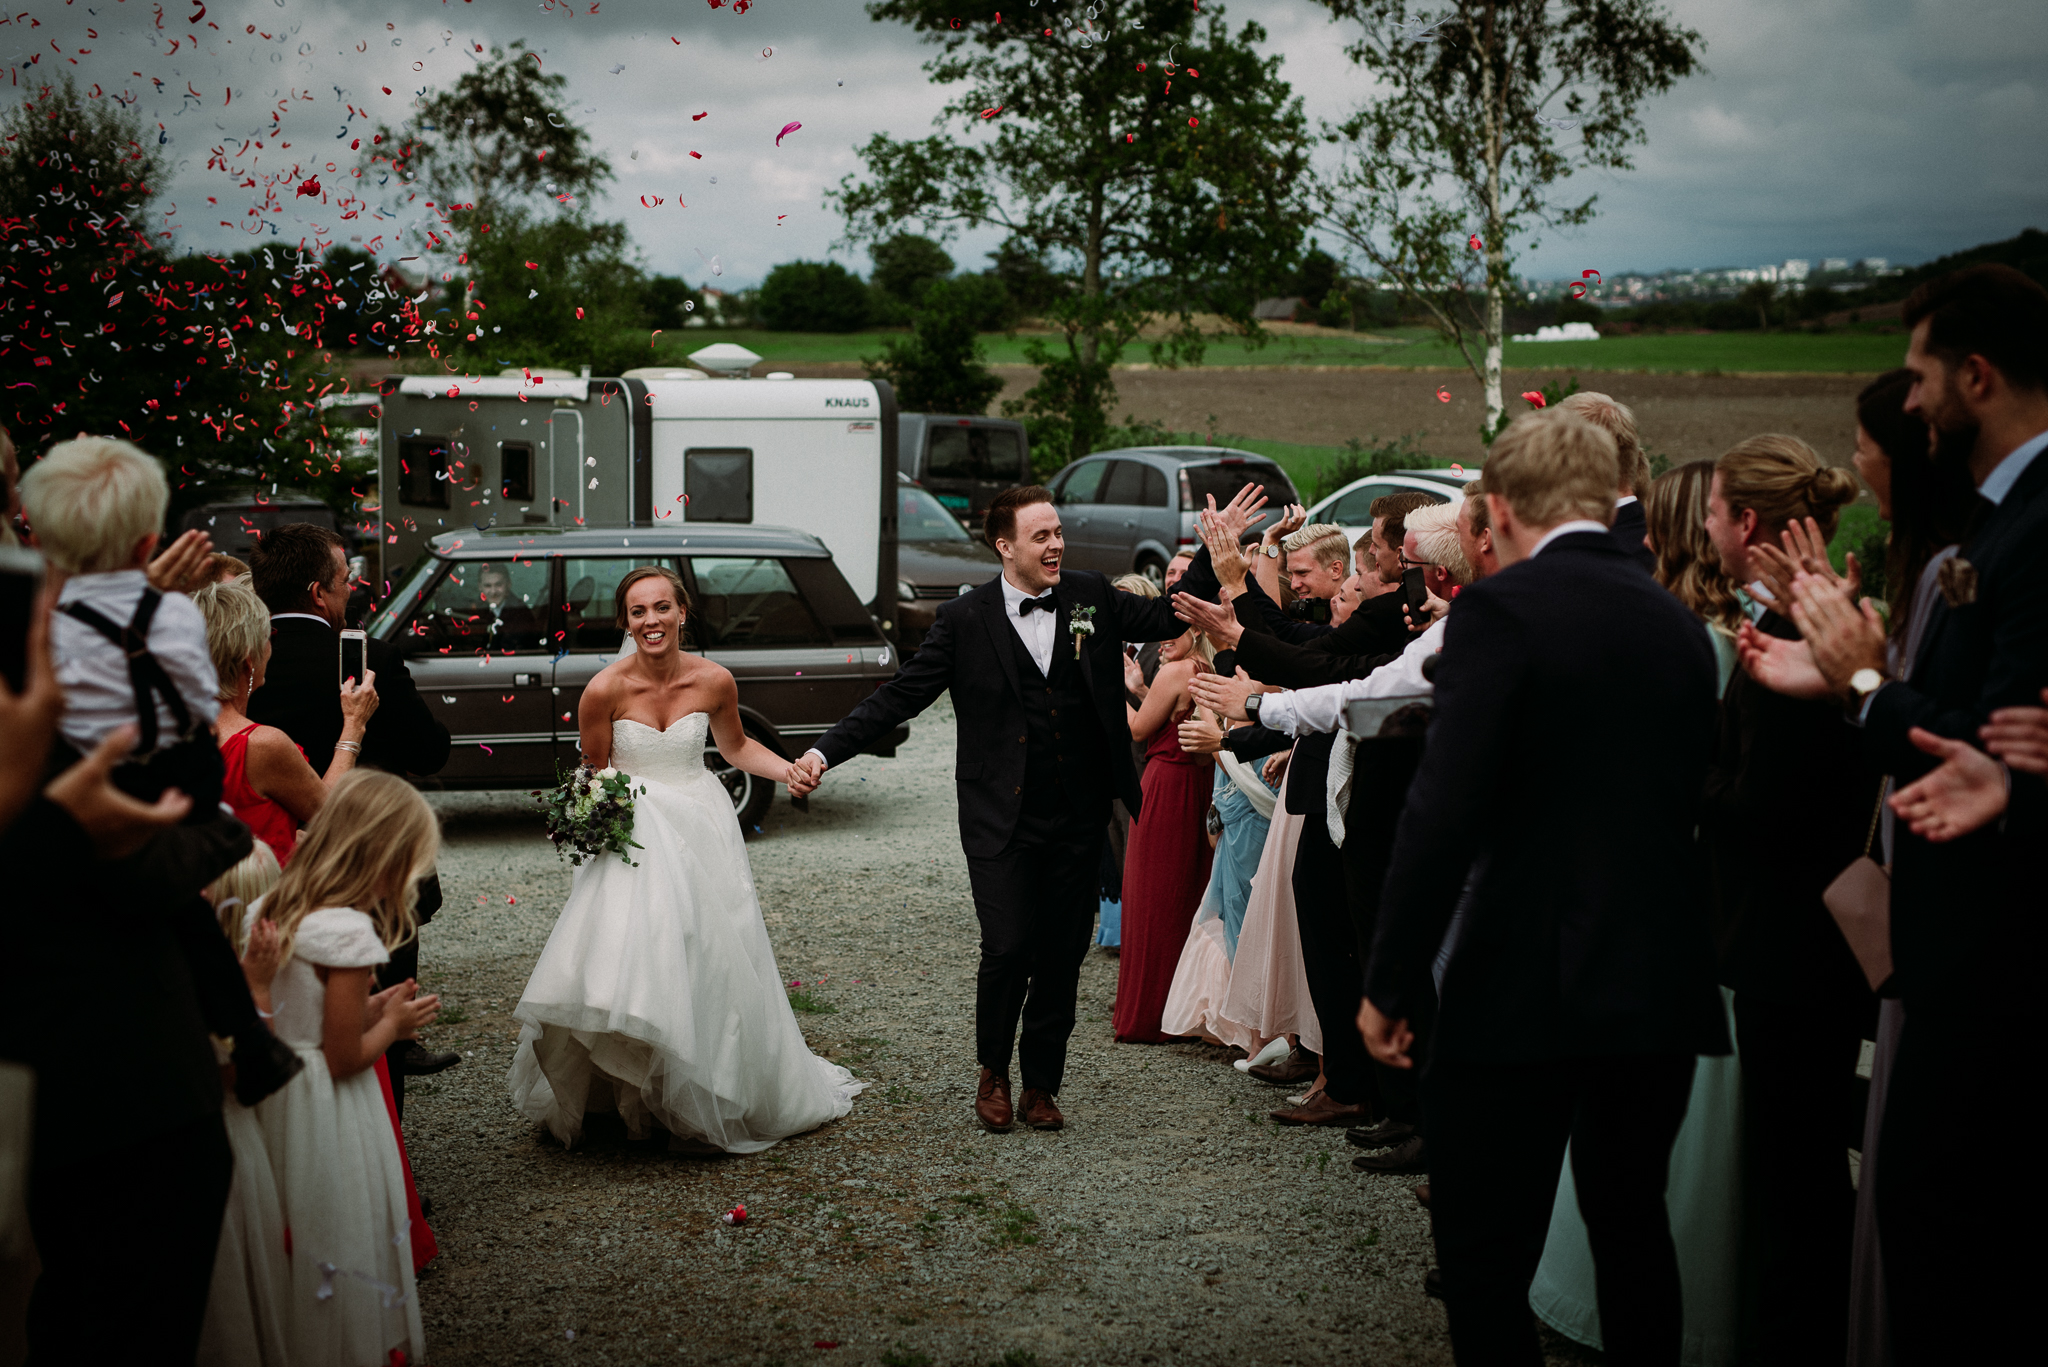 Bryllup-løen-på-sunde-bryllupsfotograf-Stavanger-Lofoten-Bergen-Oslo-45.jpg